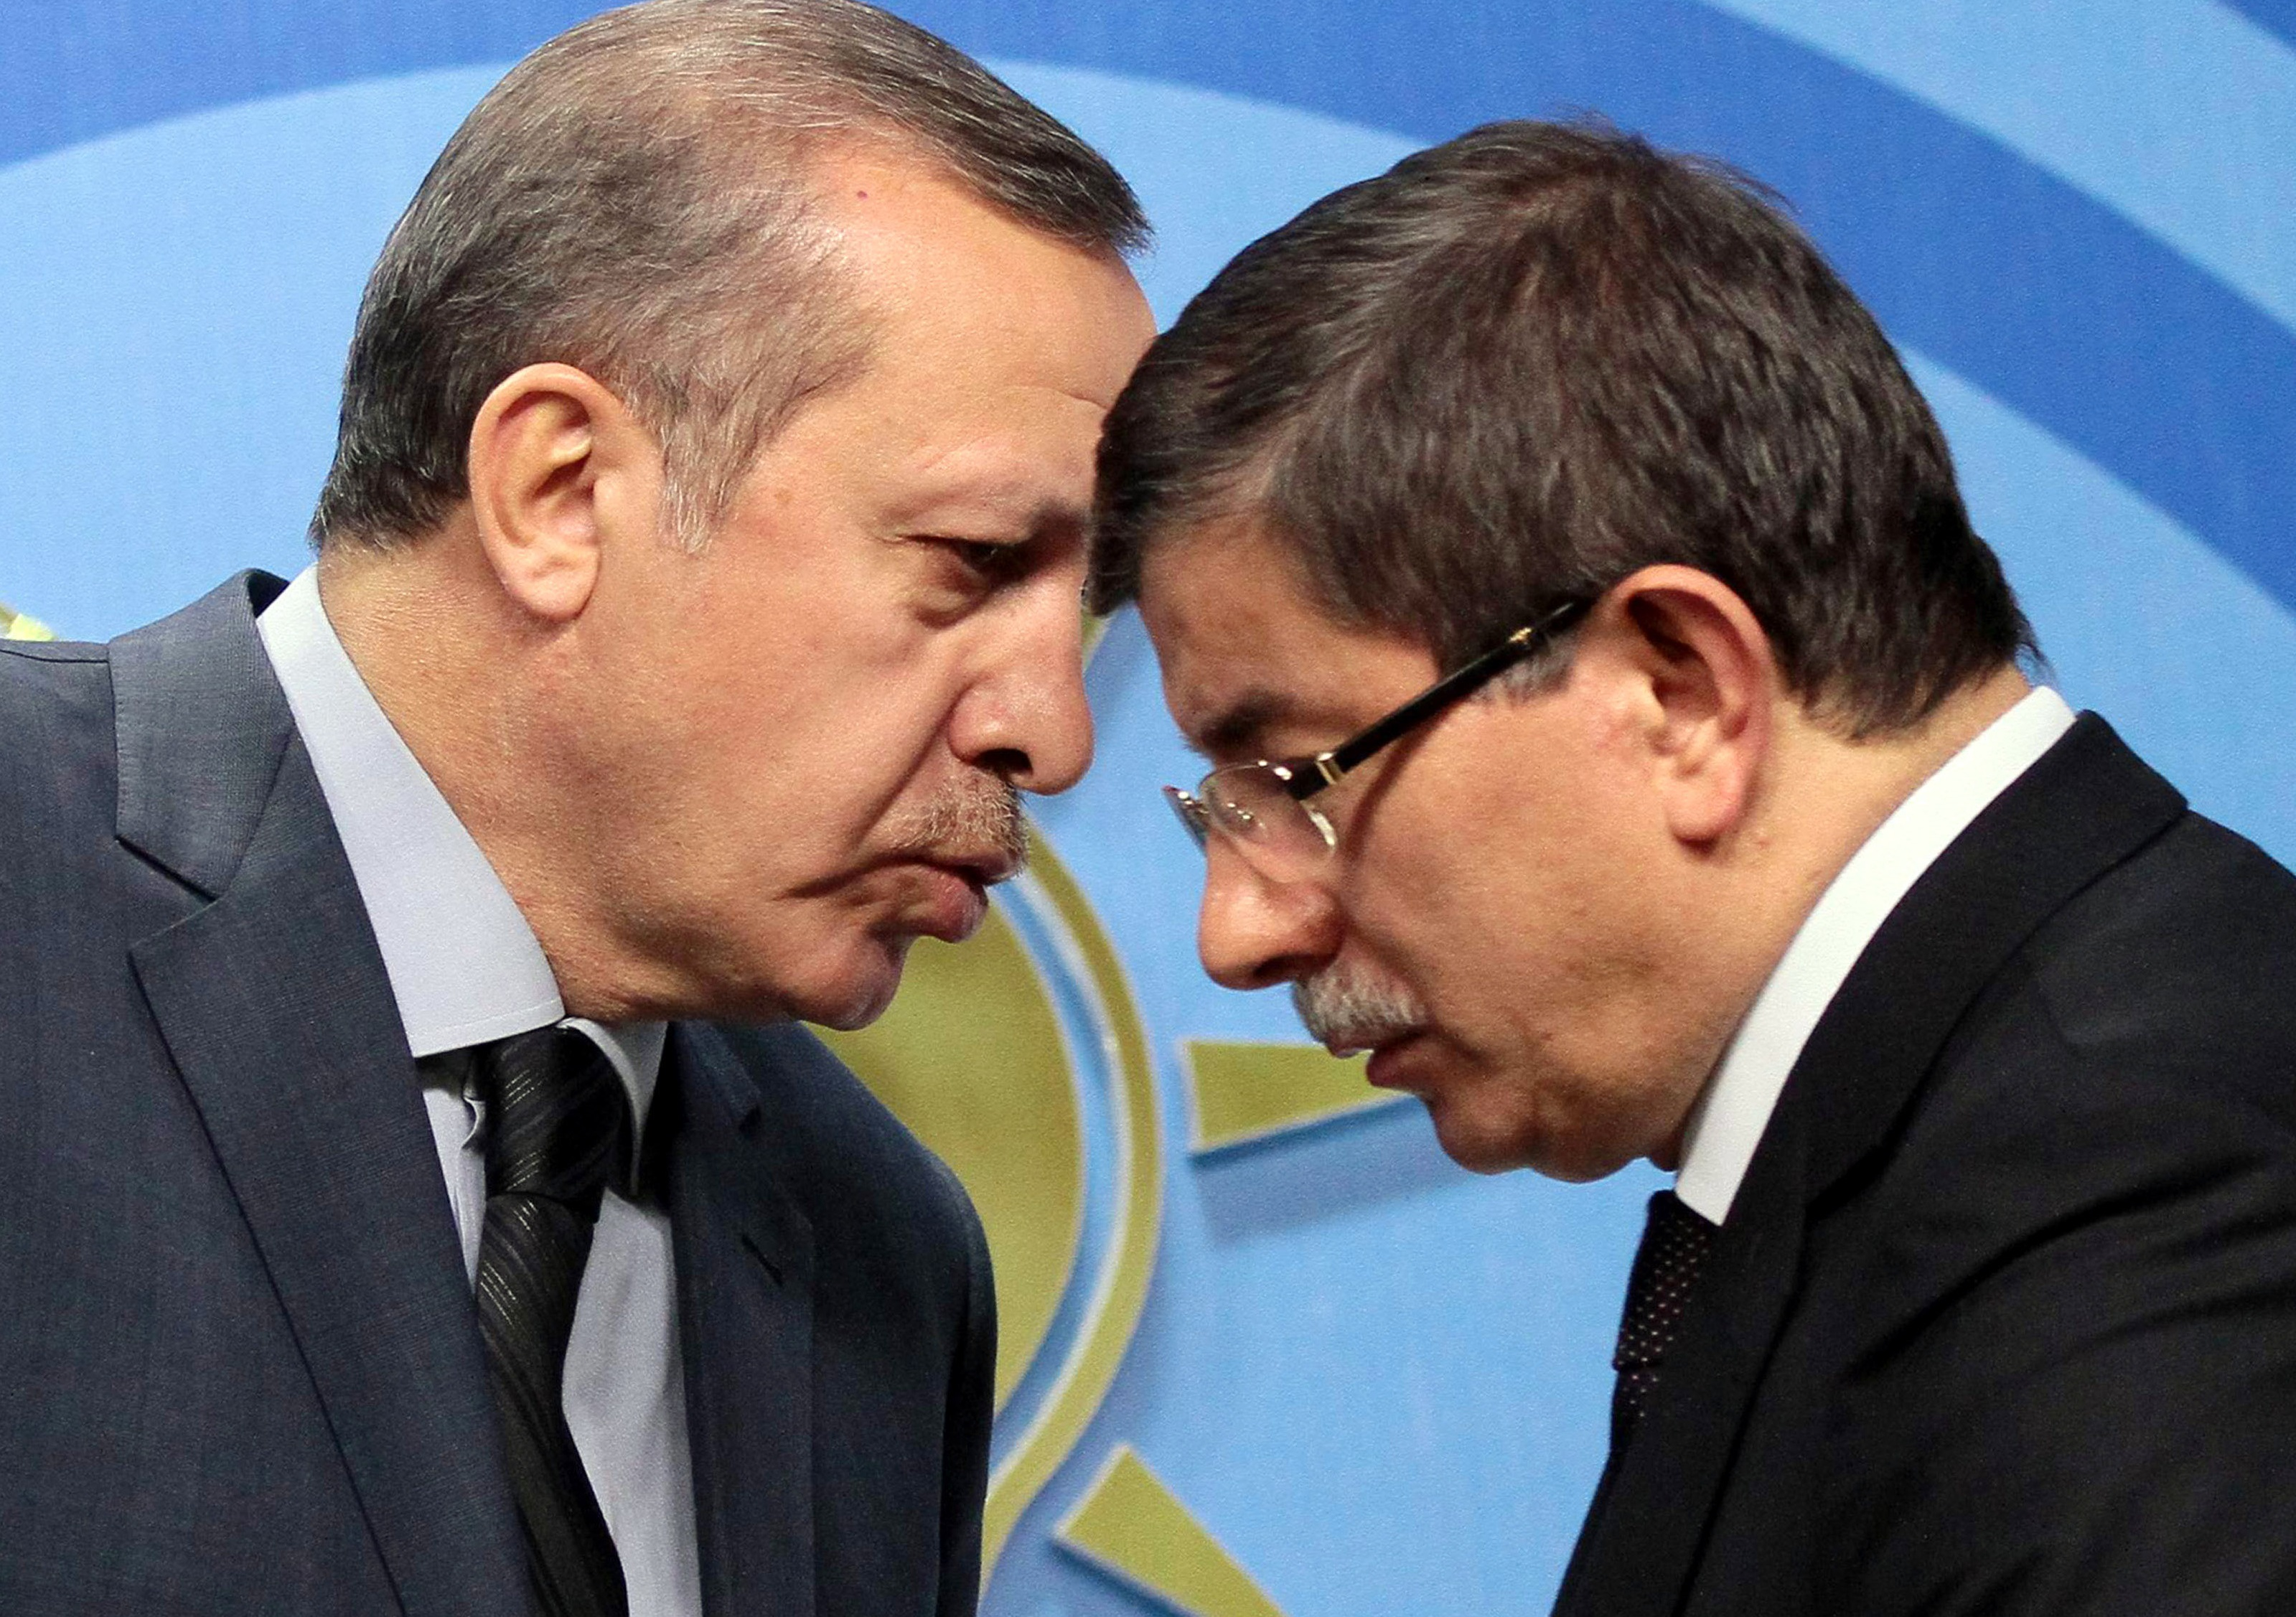 Basbakan Recep tayyip Erdogan Disisleri Bakani Ahmet Davutoglu ( 13 Haziran 2014 / Ali Unal/Arsiv)